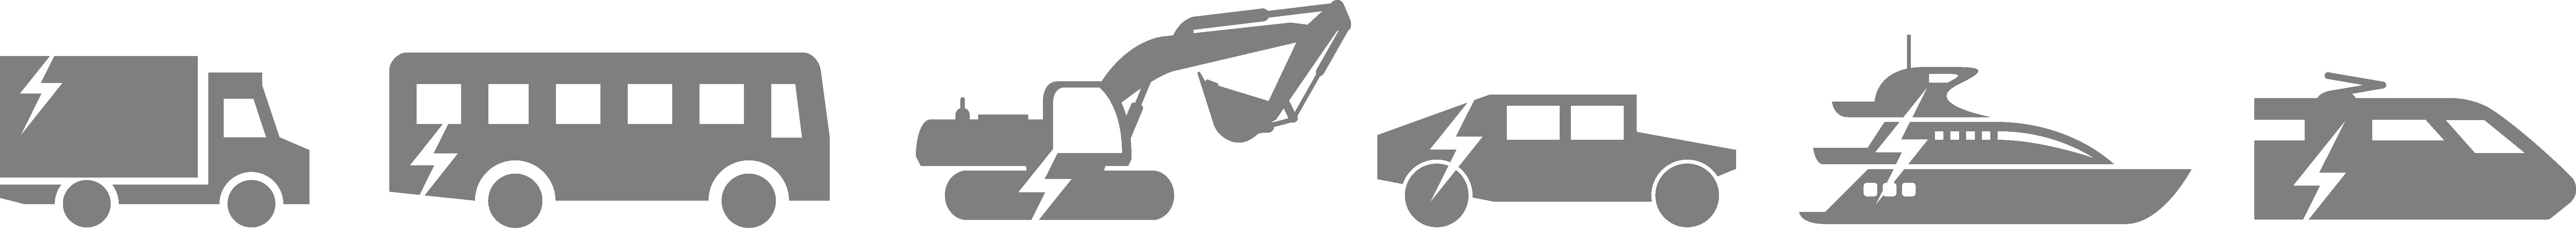 ICONS flexiEBUST MARKETS